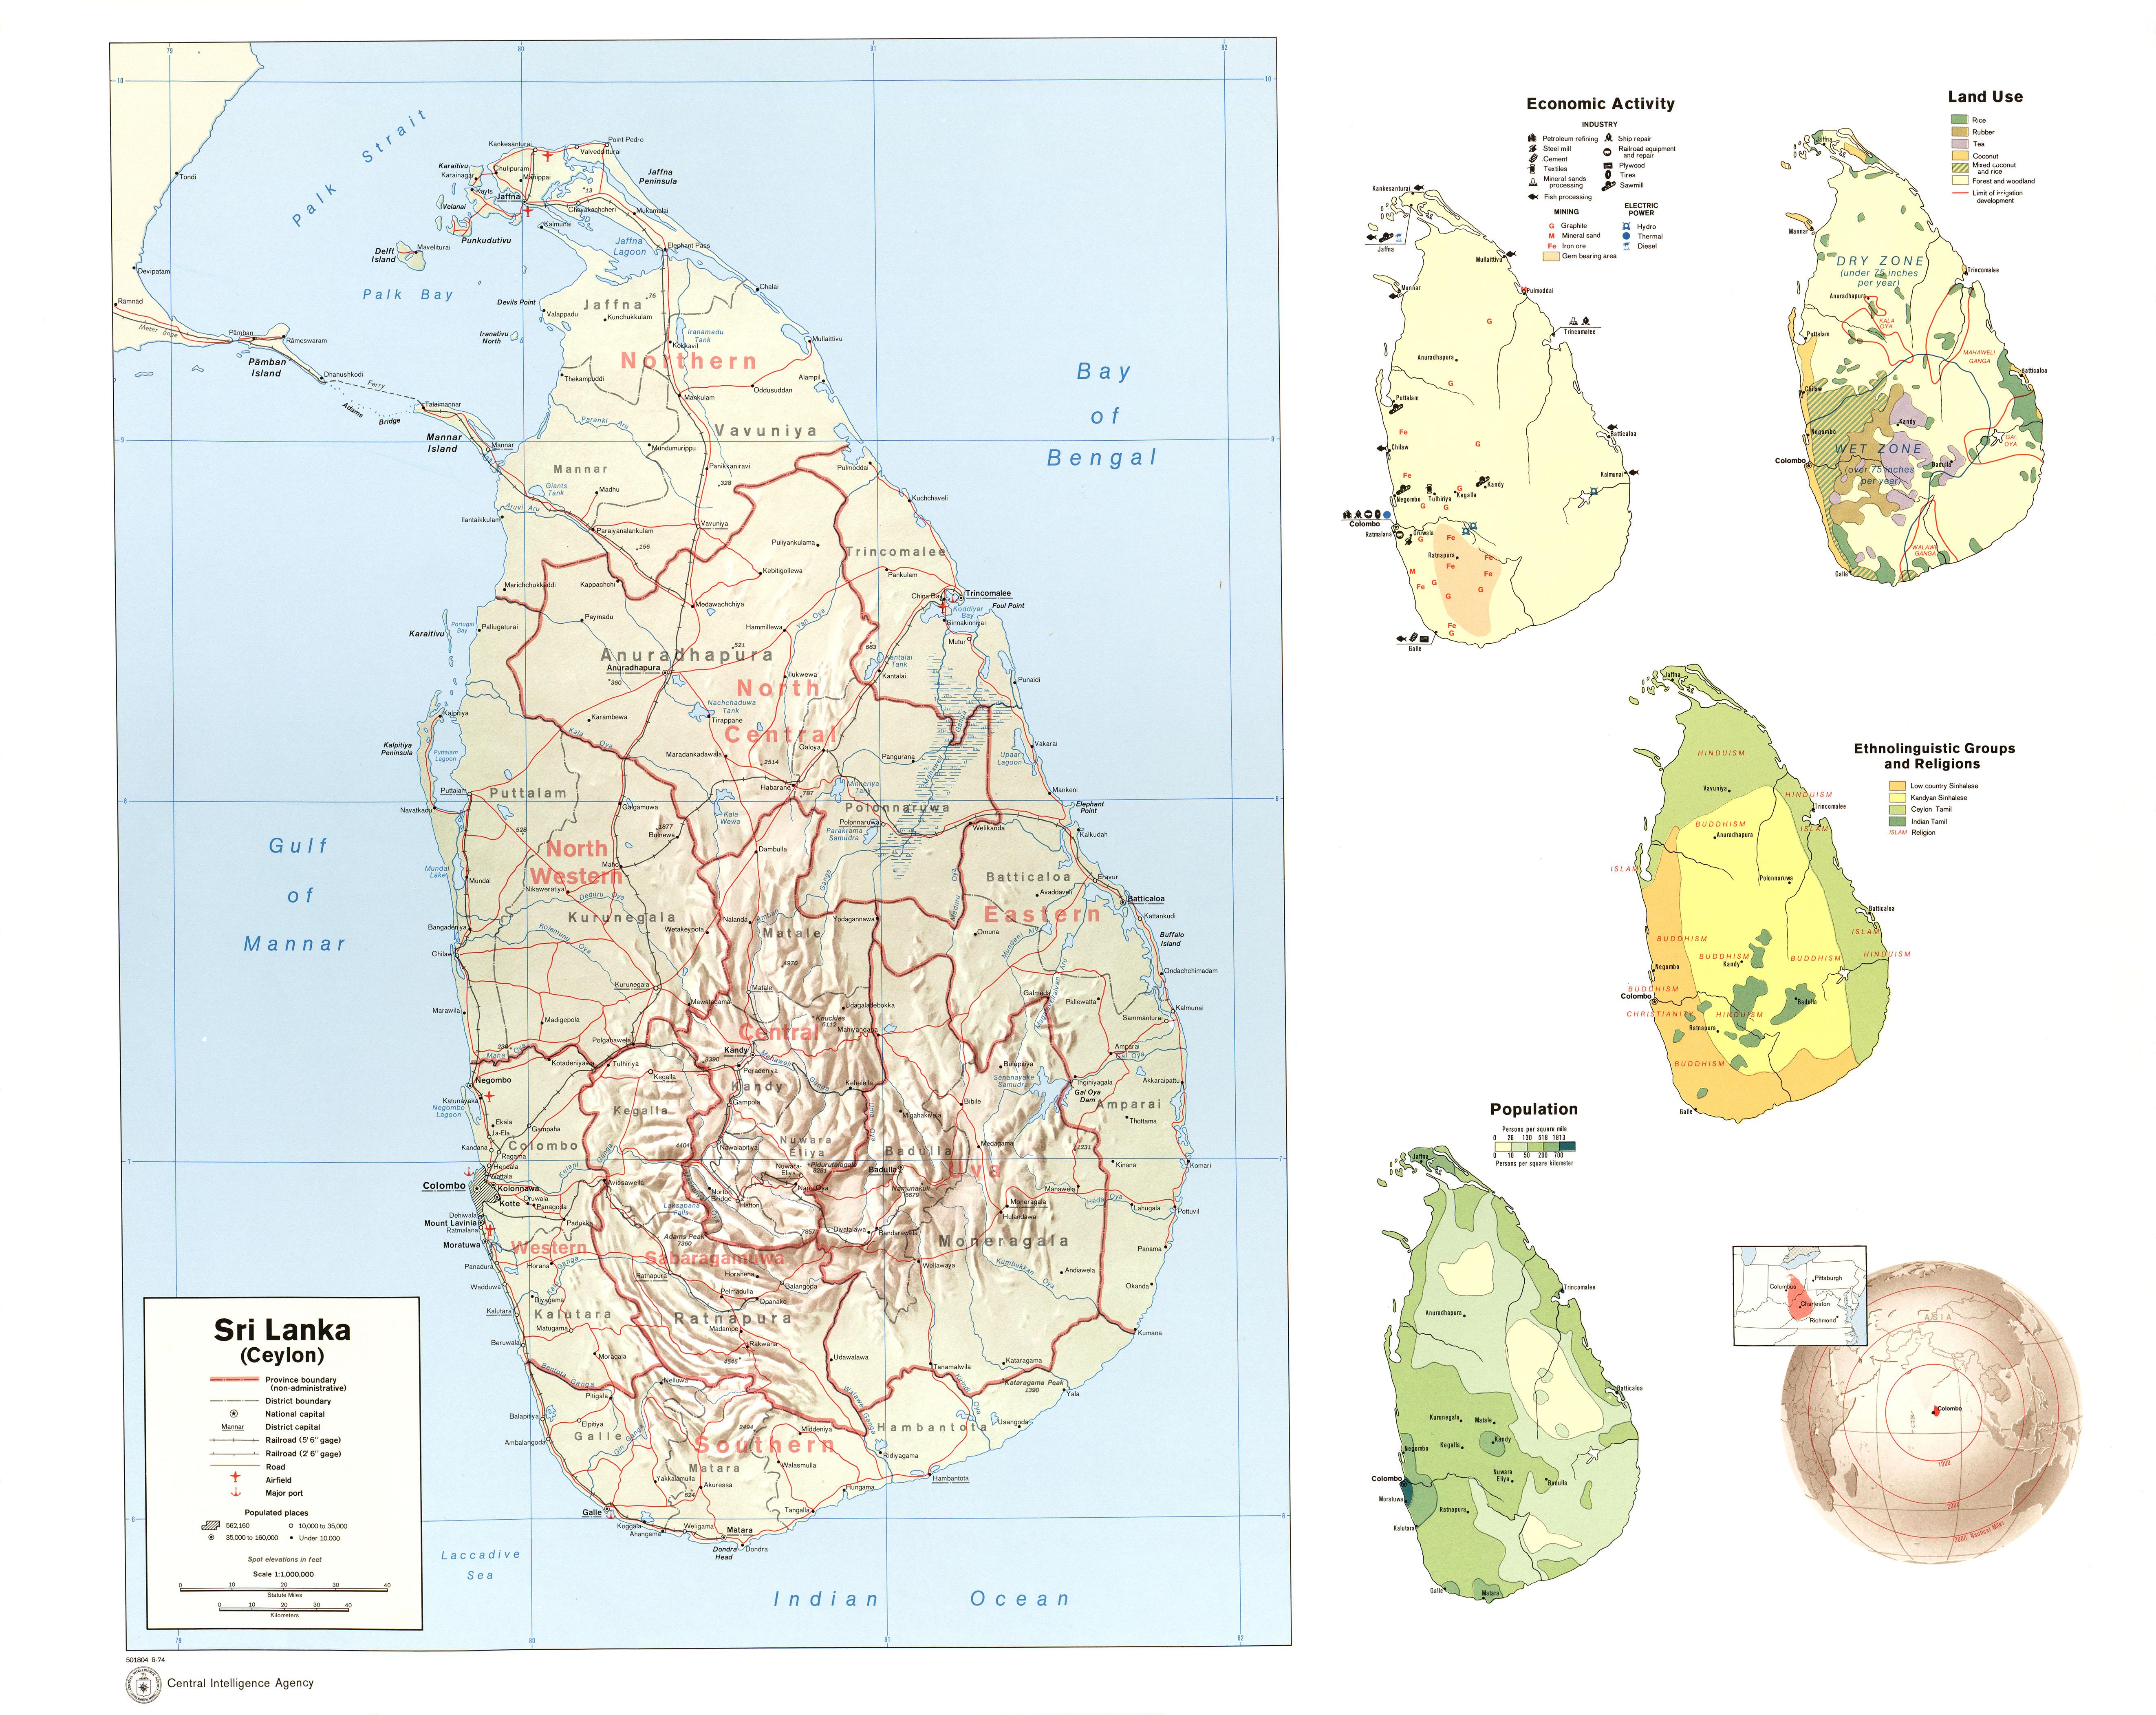 sri lanka shaded relief economic activity land use ethnolinguistic groups and religions population location 1974